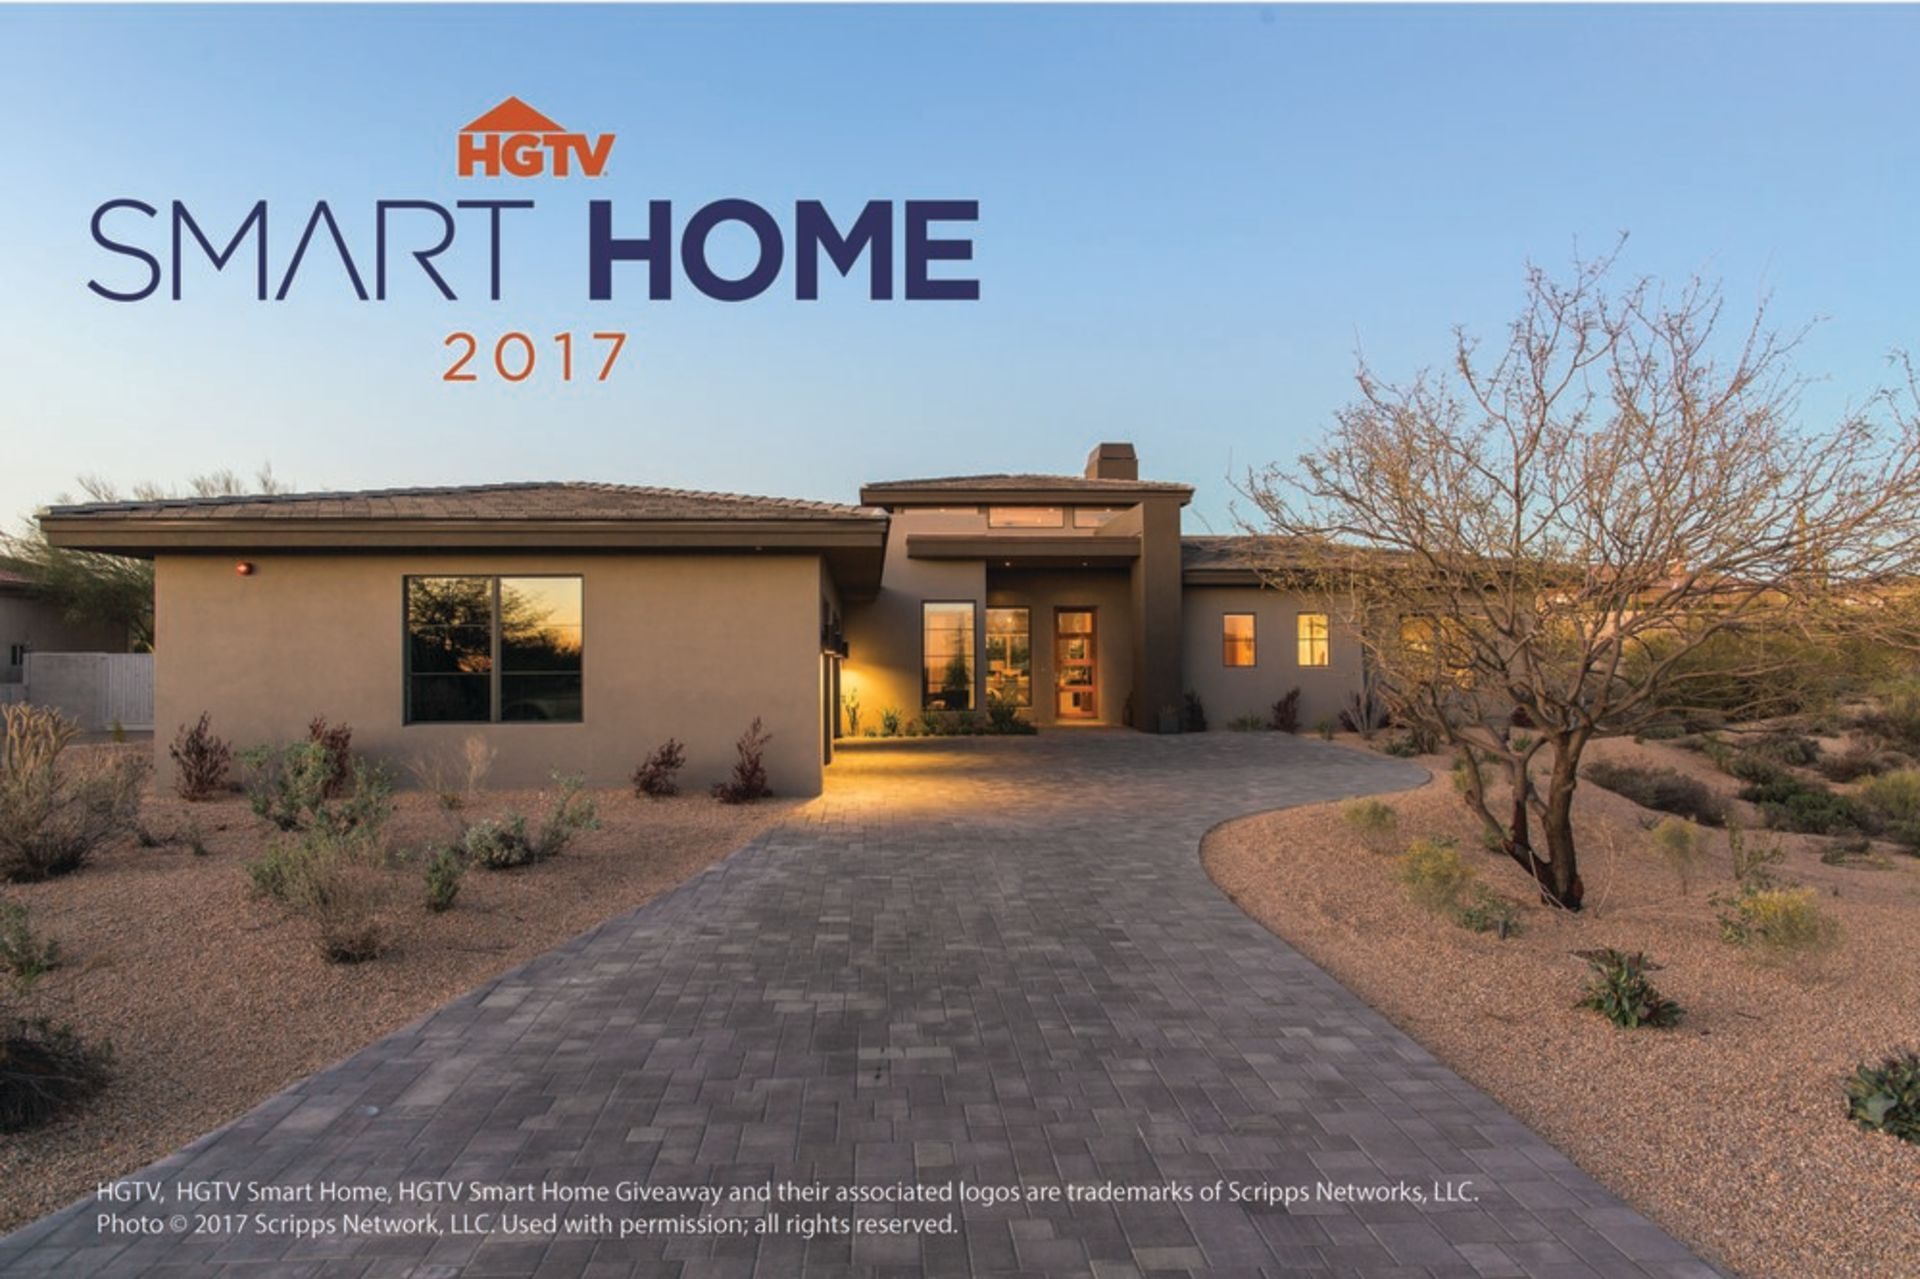 2017 HGTV Smart Home